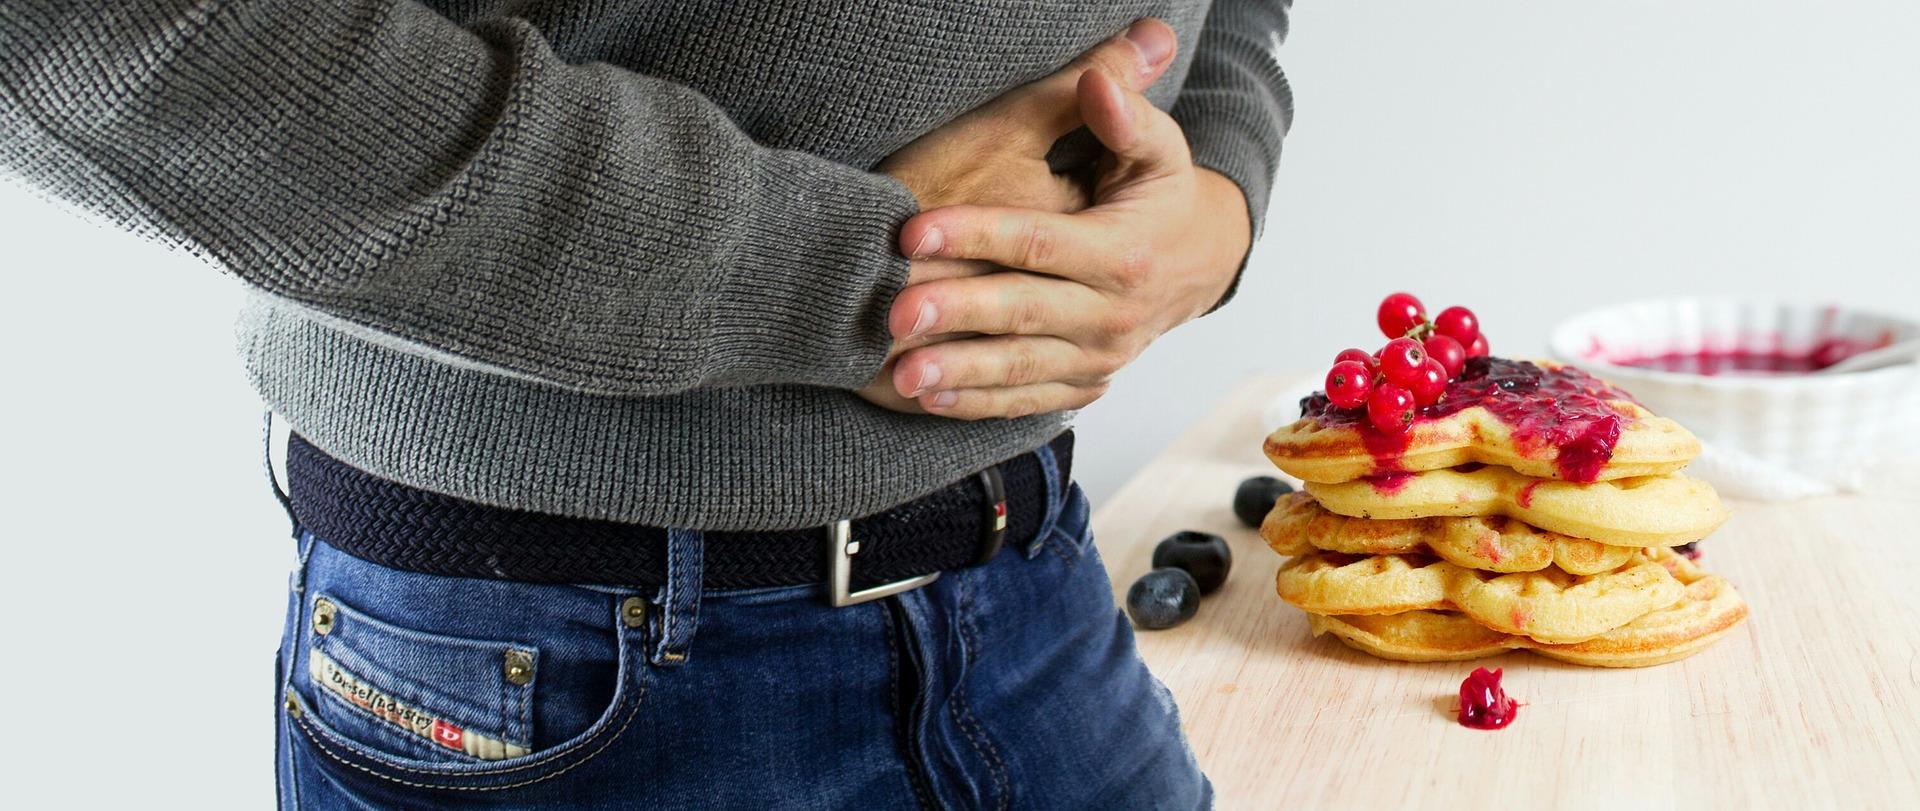 Food intolorance